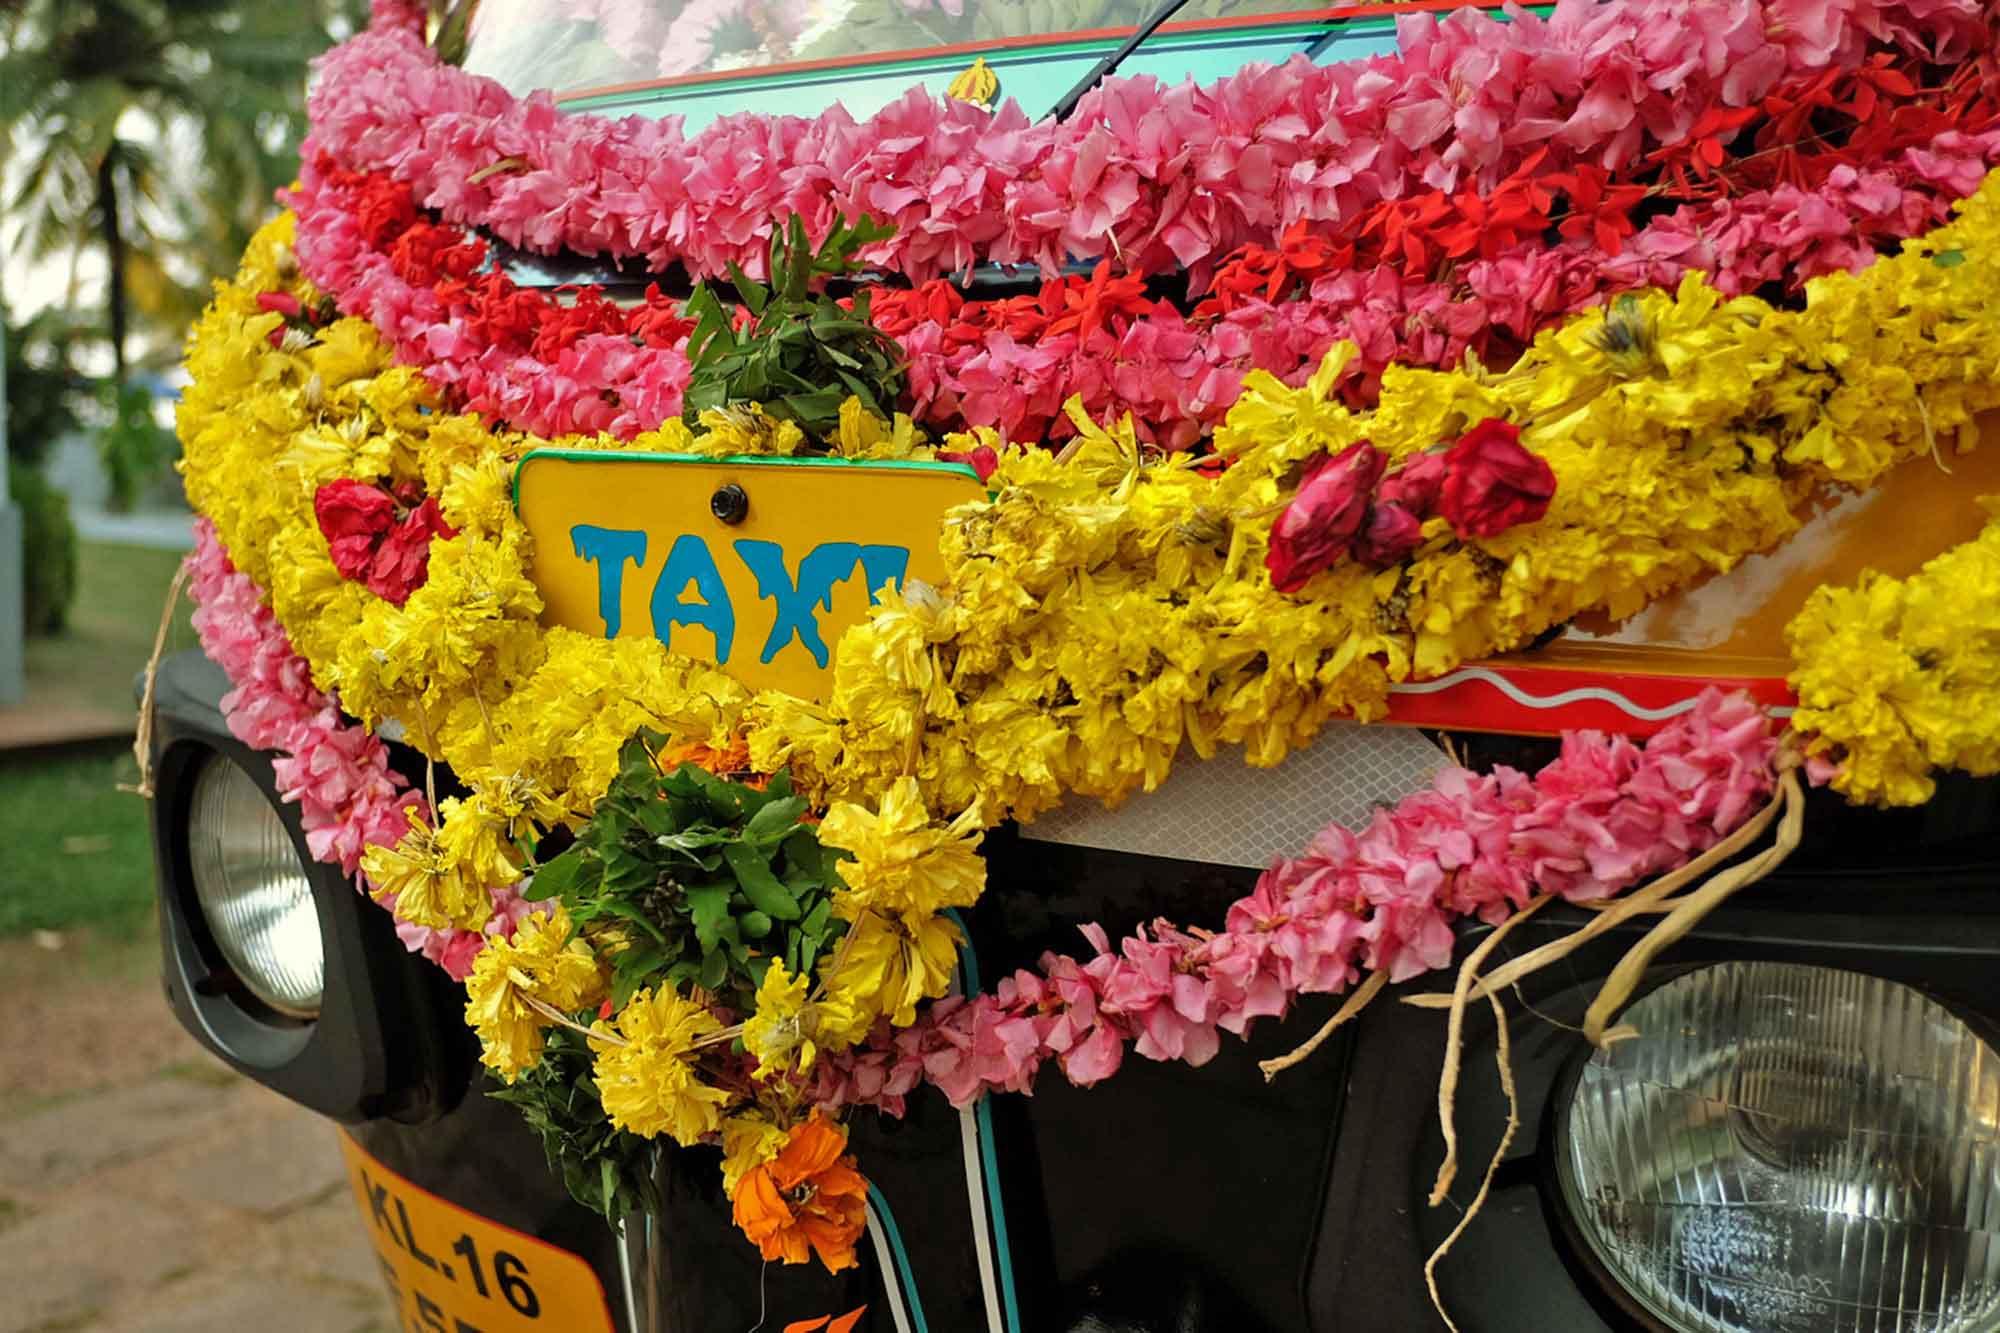 https://www.soulandsurf.com/wp-content/uploads/2021/09/Retreatsindia-images-Photo-2014-11-17-9-29-18-PM-1.jpg